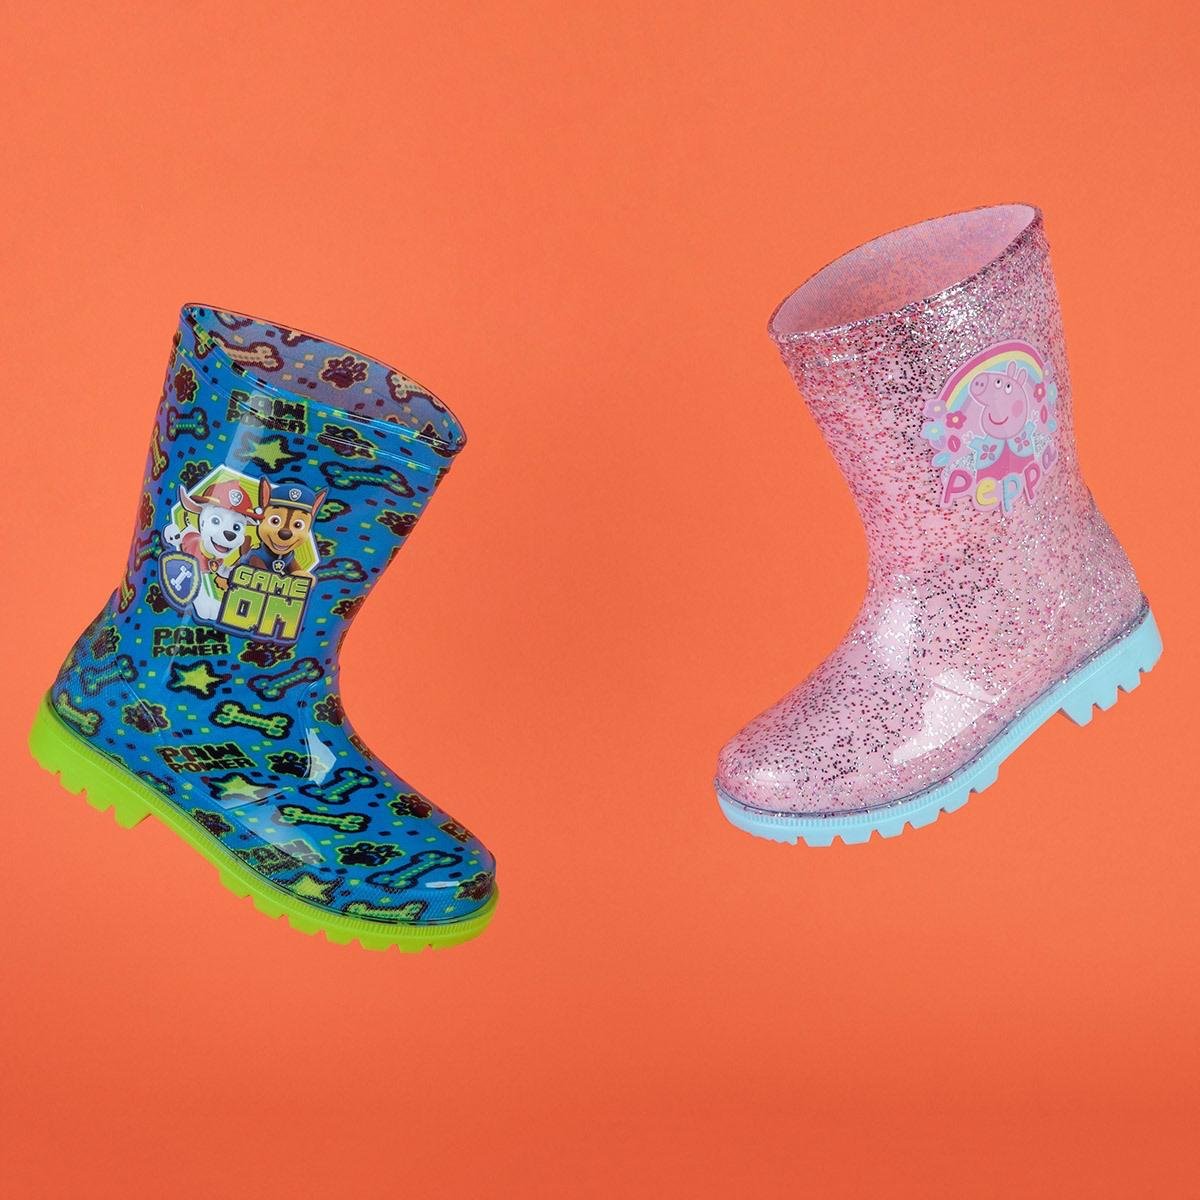 Splashproof your kids at Shoe Zone